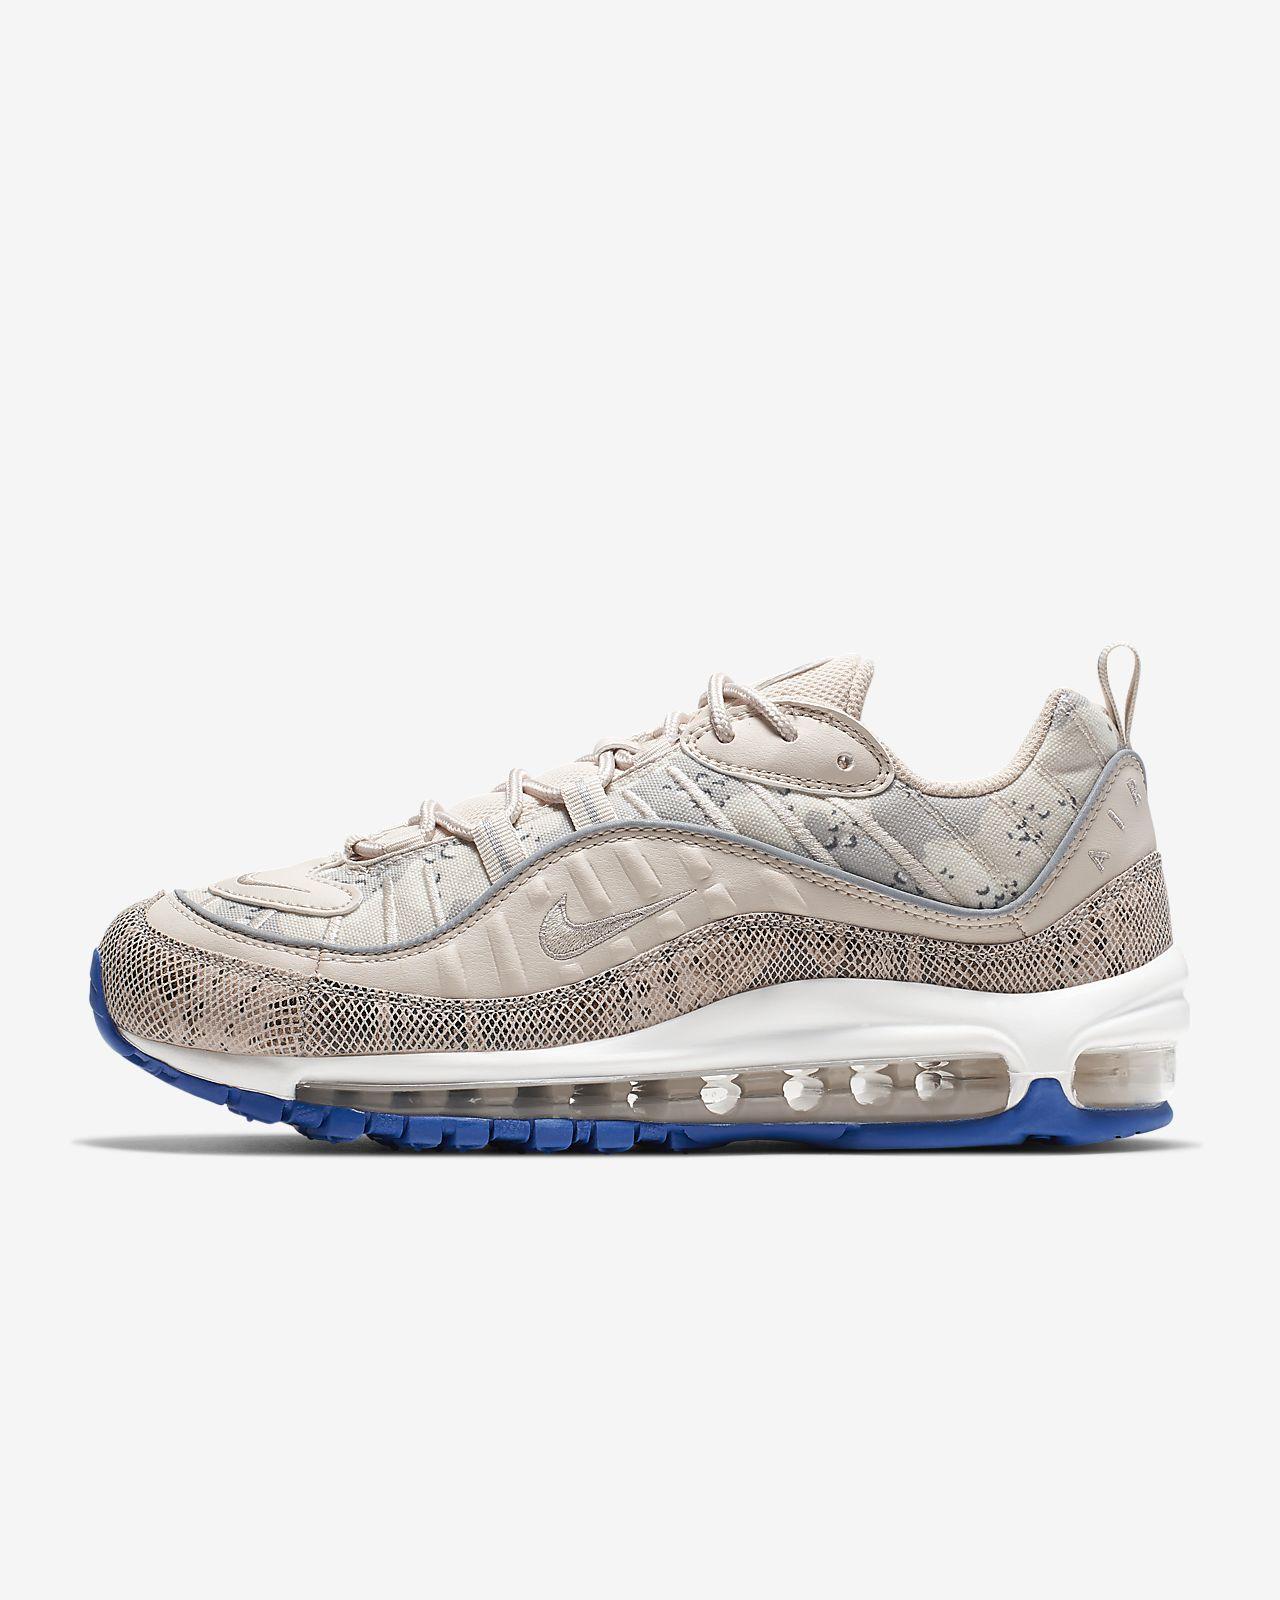 Nike Air Max 98 Premium Camo Women's Shoe